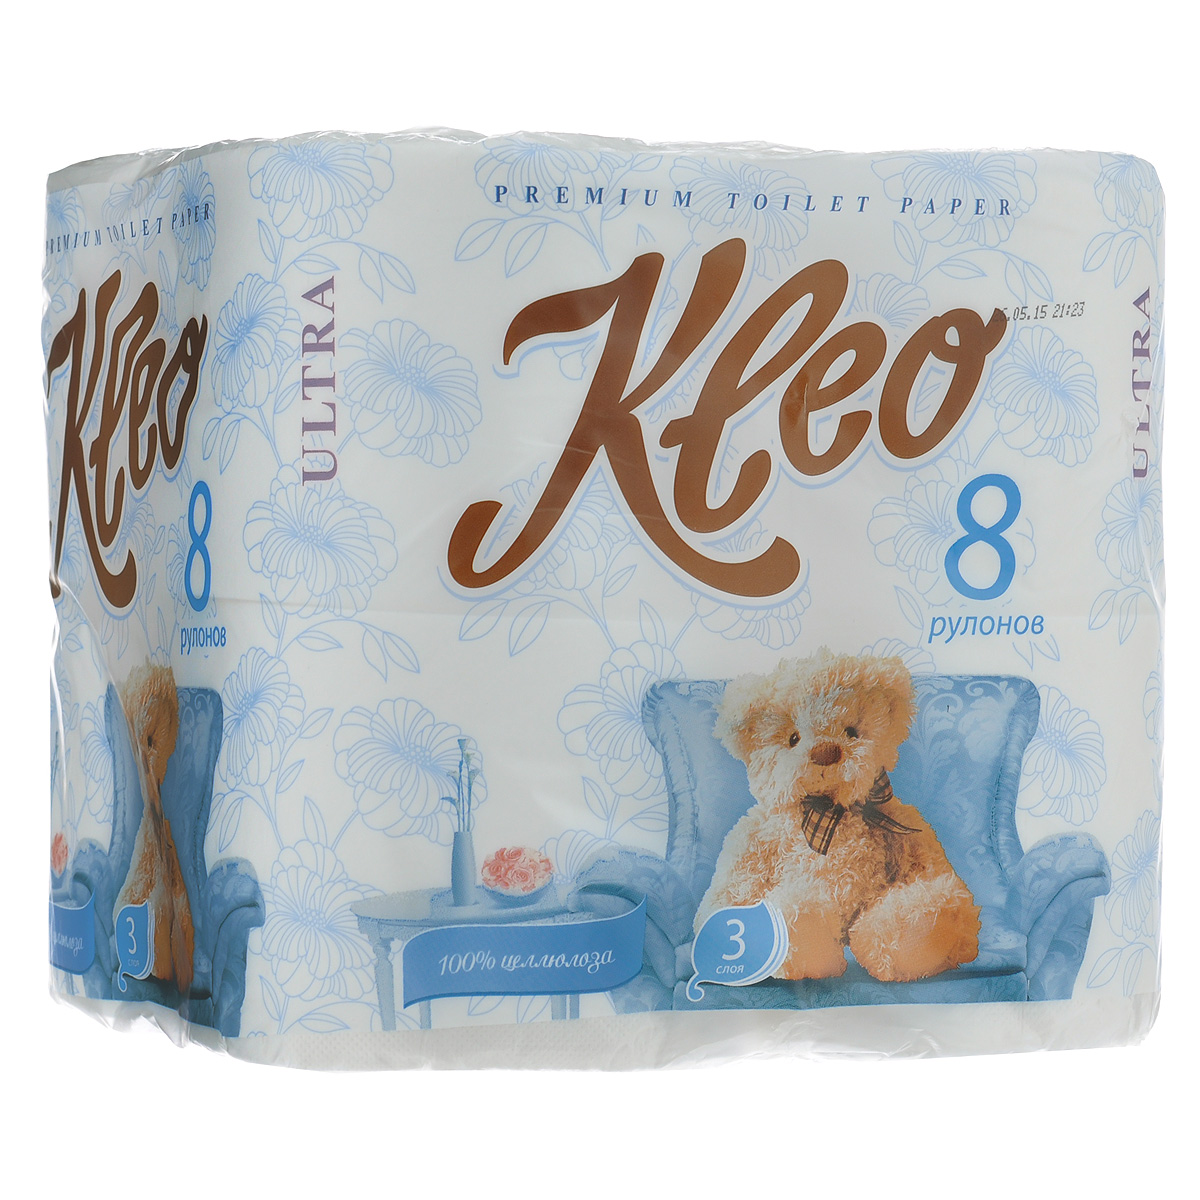 Туалетная бумага Мягкий знак Kleo Ultra, трехслойная, цвет: белый, 8 рулонов туалетная бумага анекдоты ч 8 мини 815605